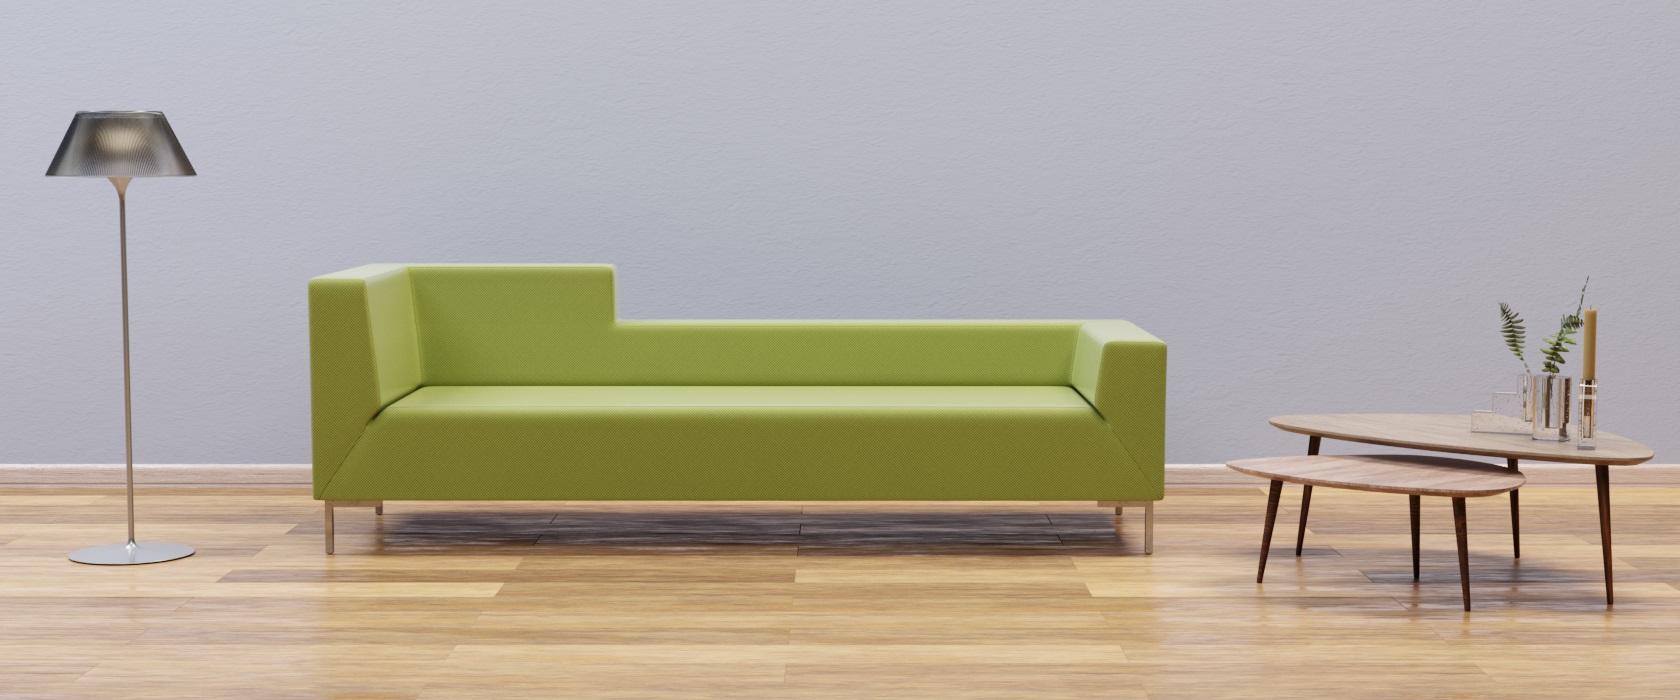 Трехместный диван Livorno Mix - Фото 2 - Pufetto